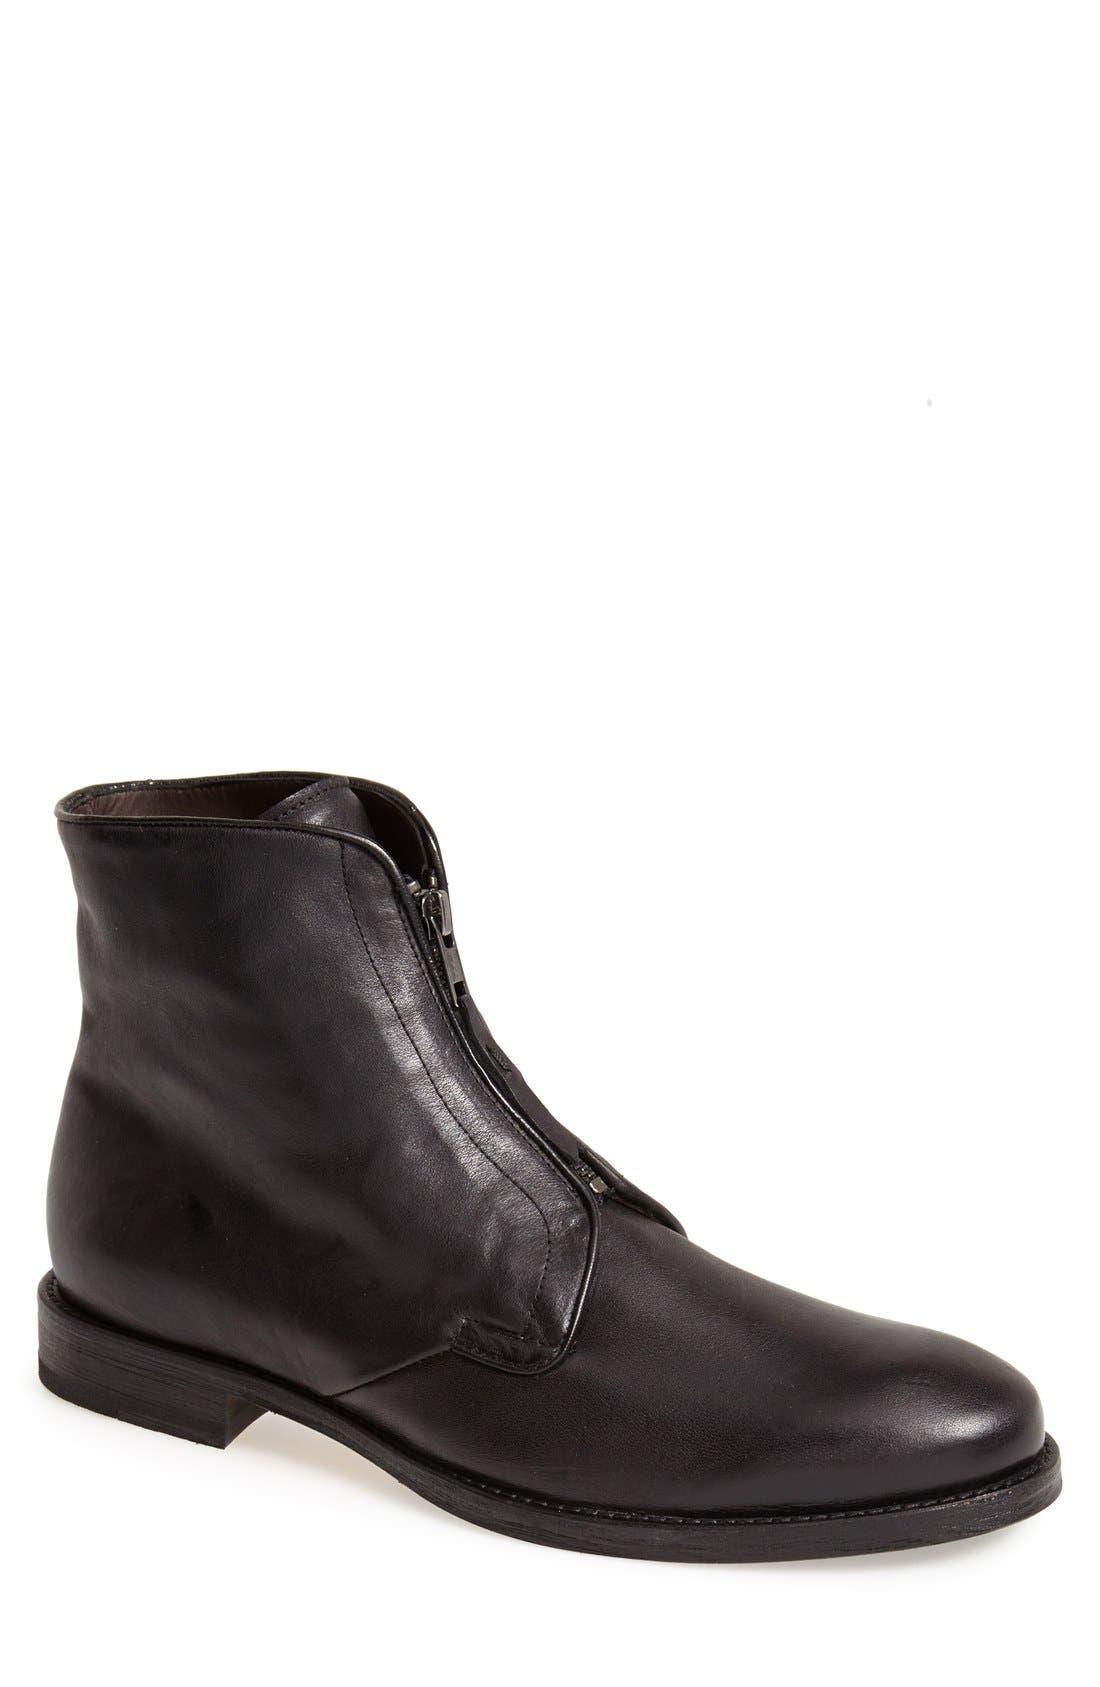 Main Image - Maison Forte 'Guerra' Zip Boot